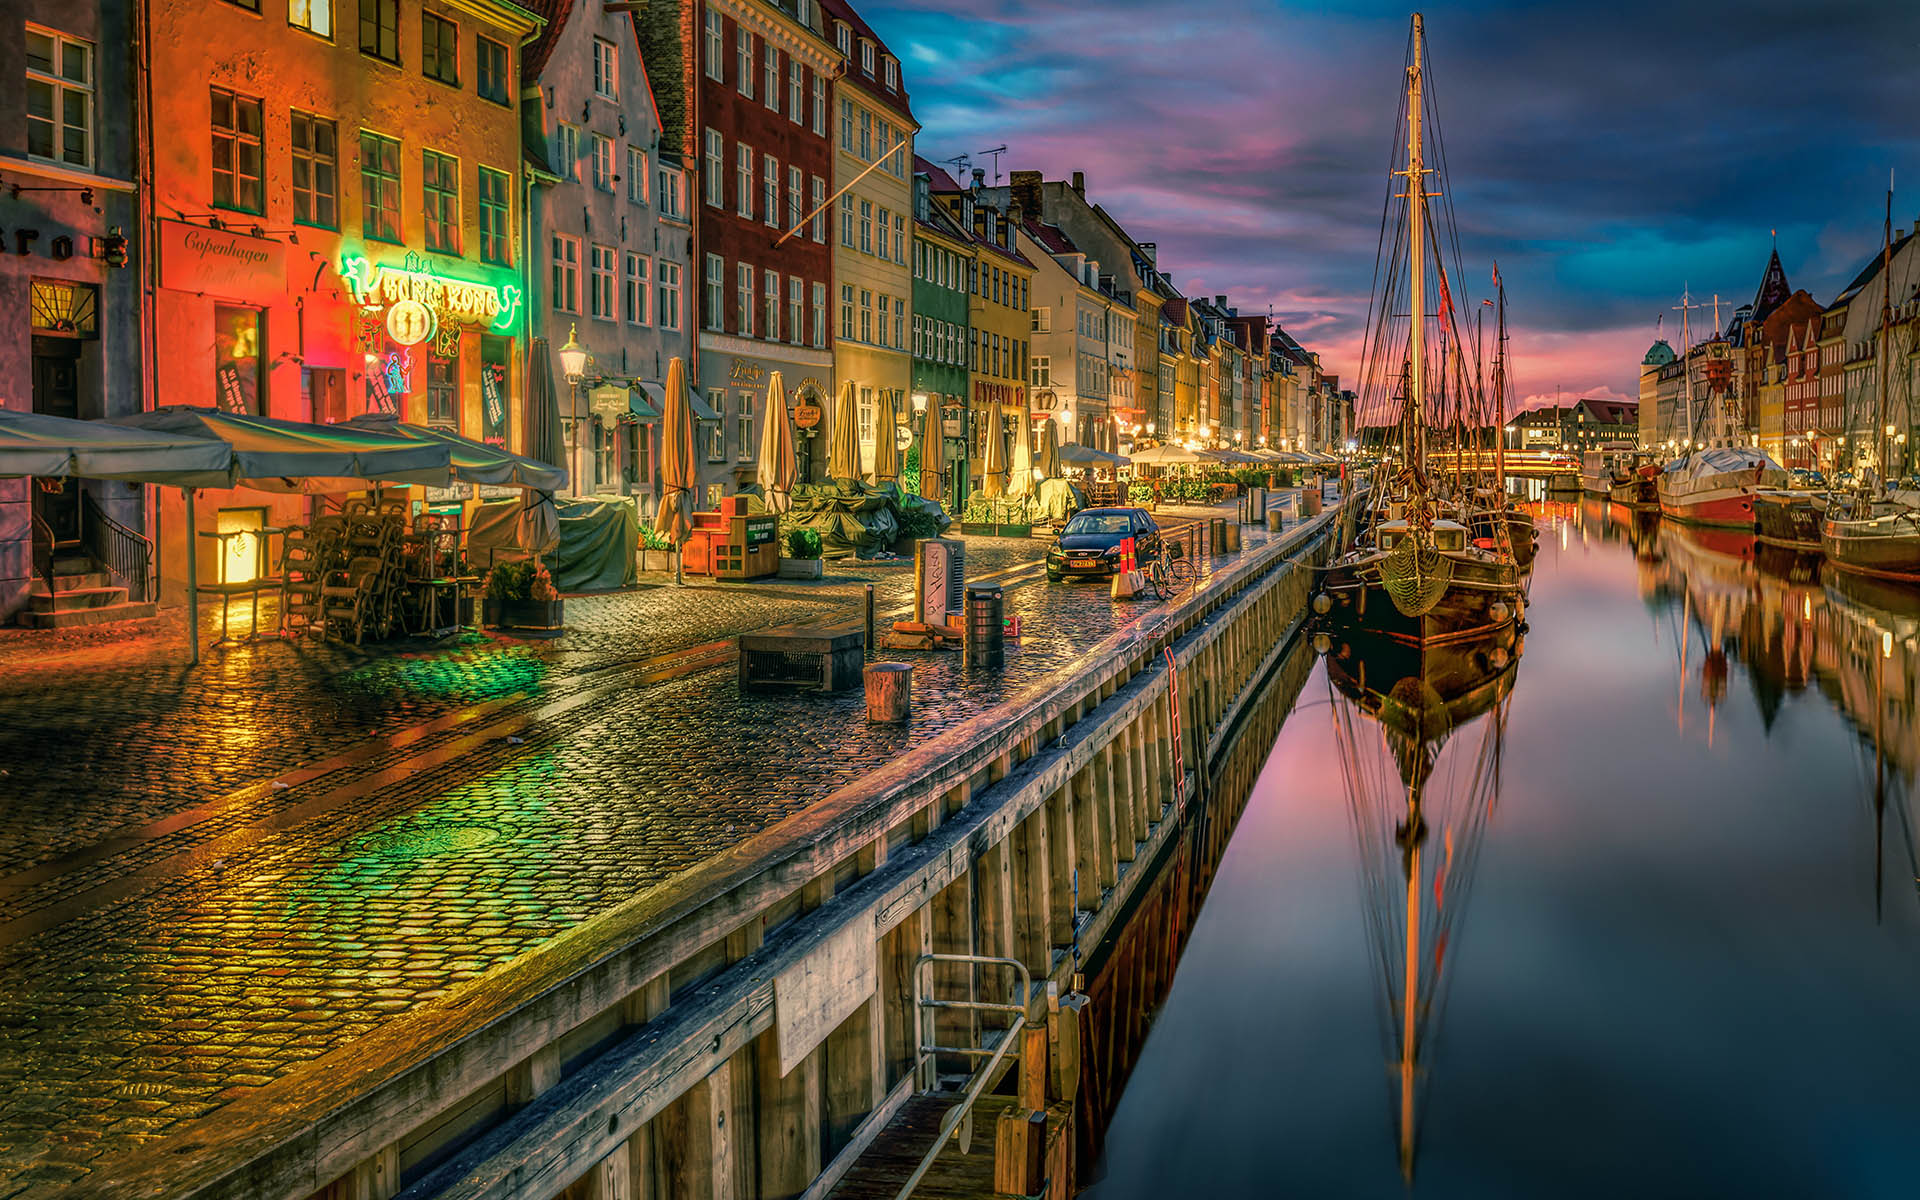 Река и корабль Дания Копенгаген